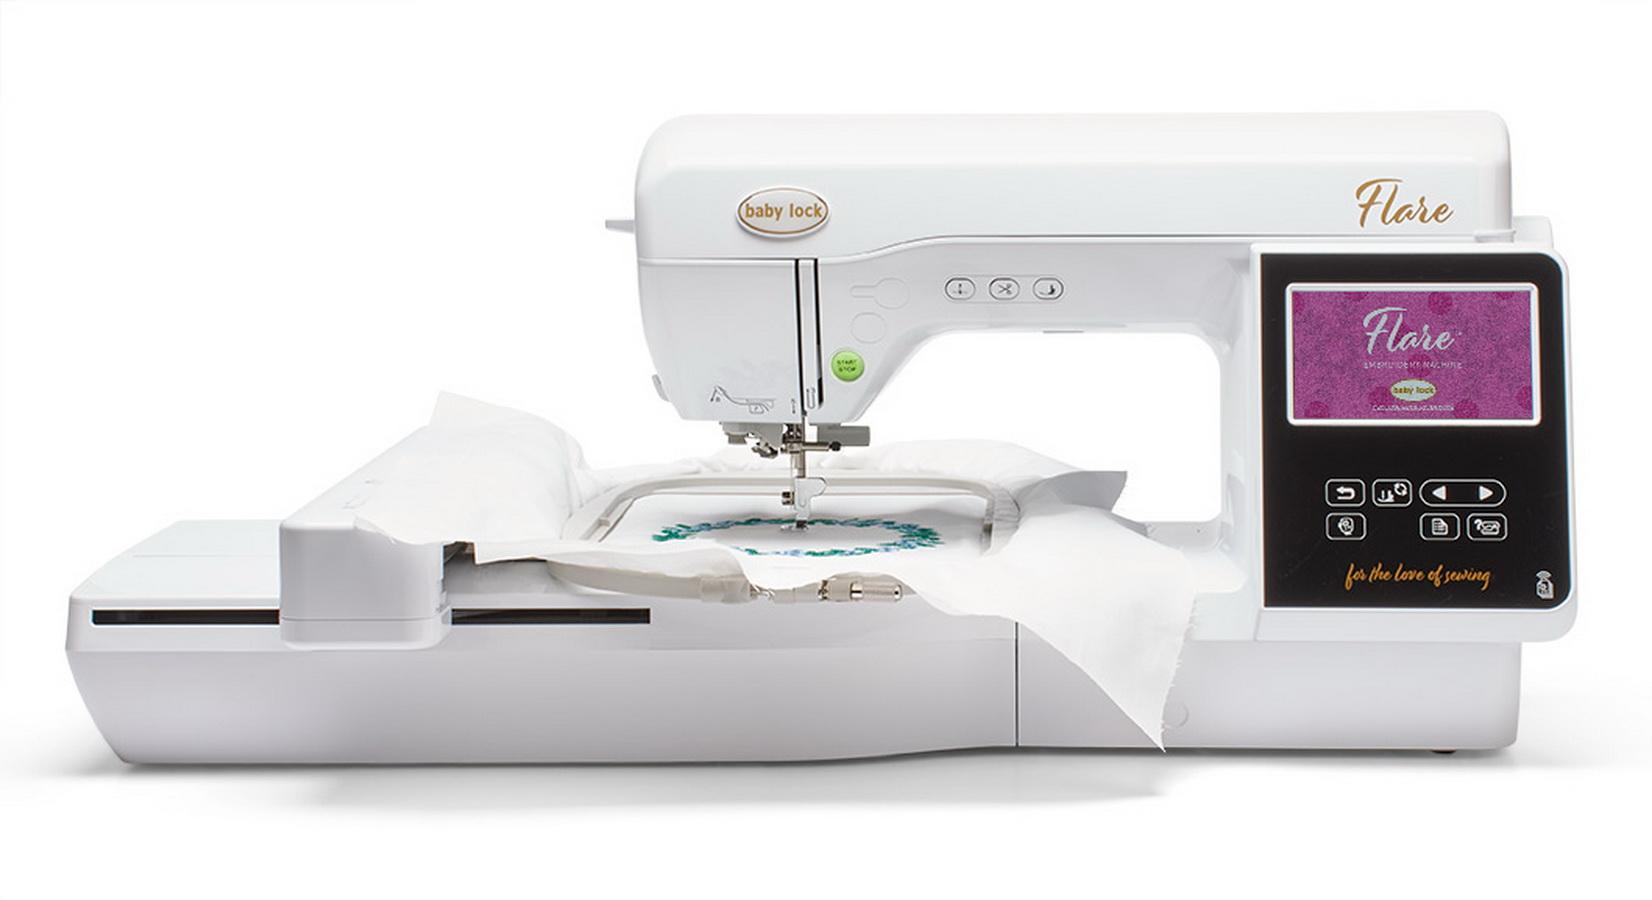 Baby Lock Flare Single Needle Embroidery Machine